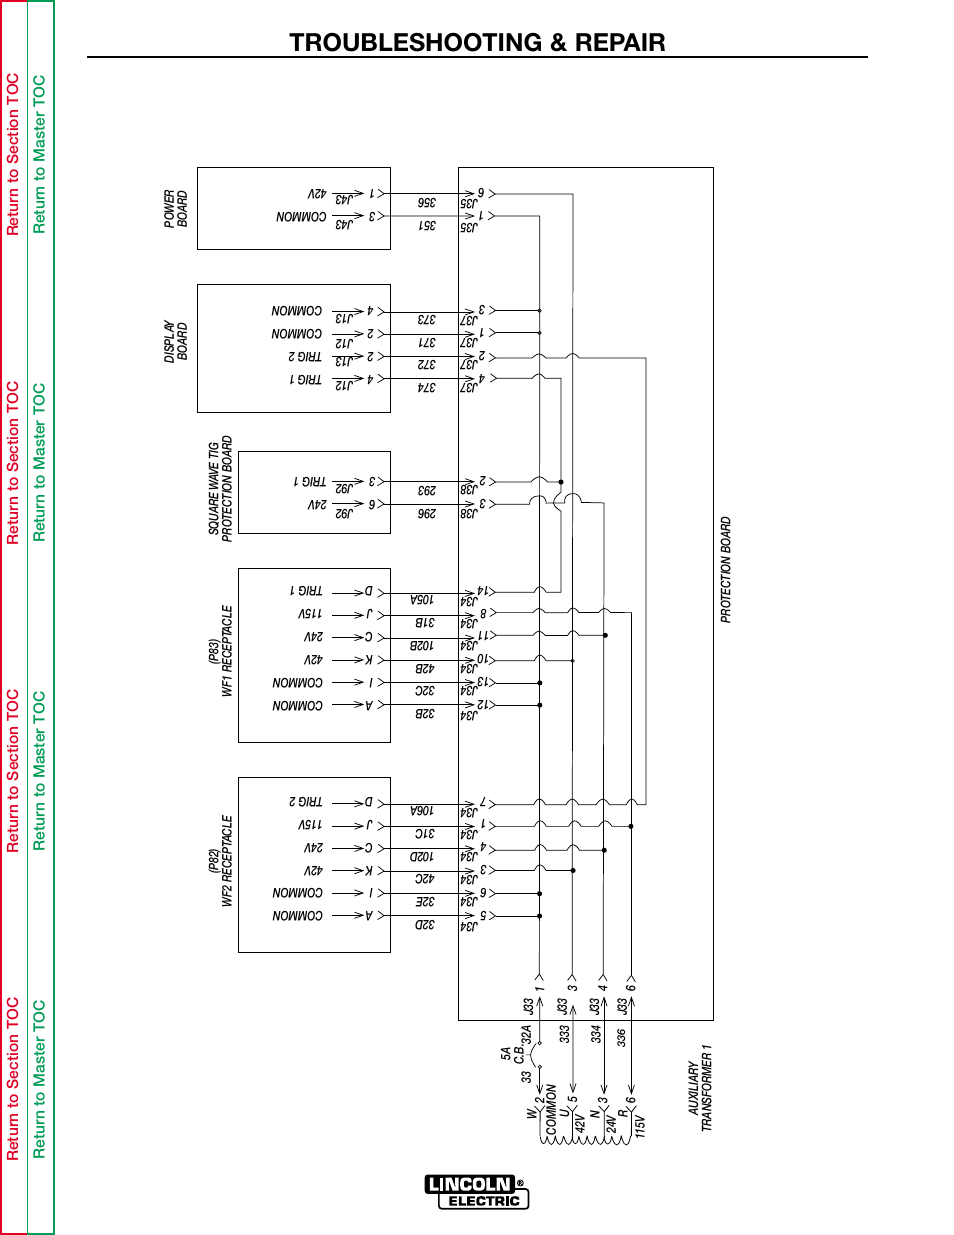 medium resolution of cuit wiring diagram figure f 44 troubleshooting repair lincoln electric invertec